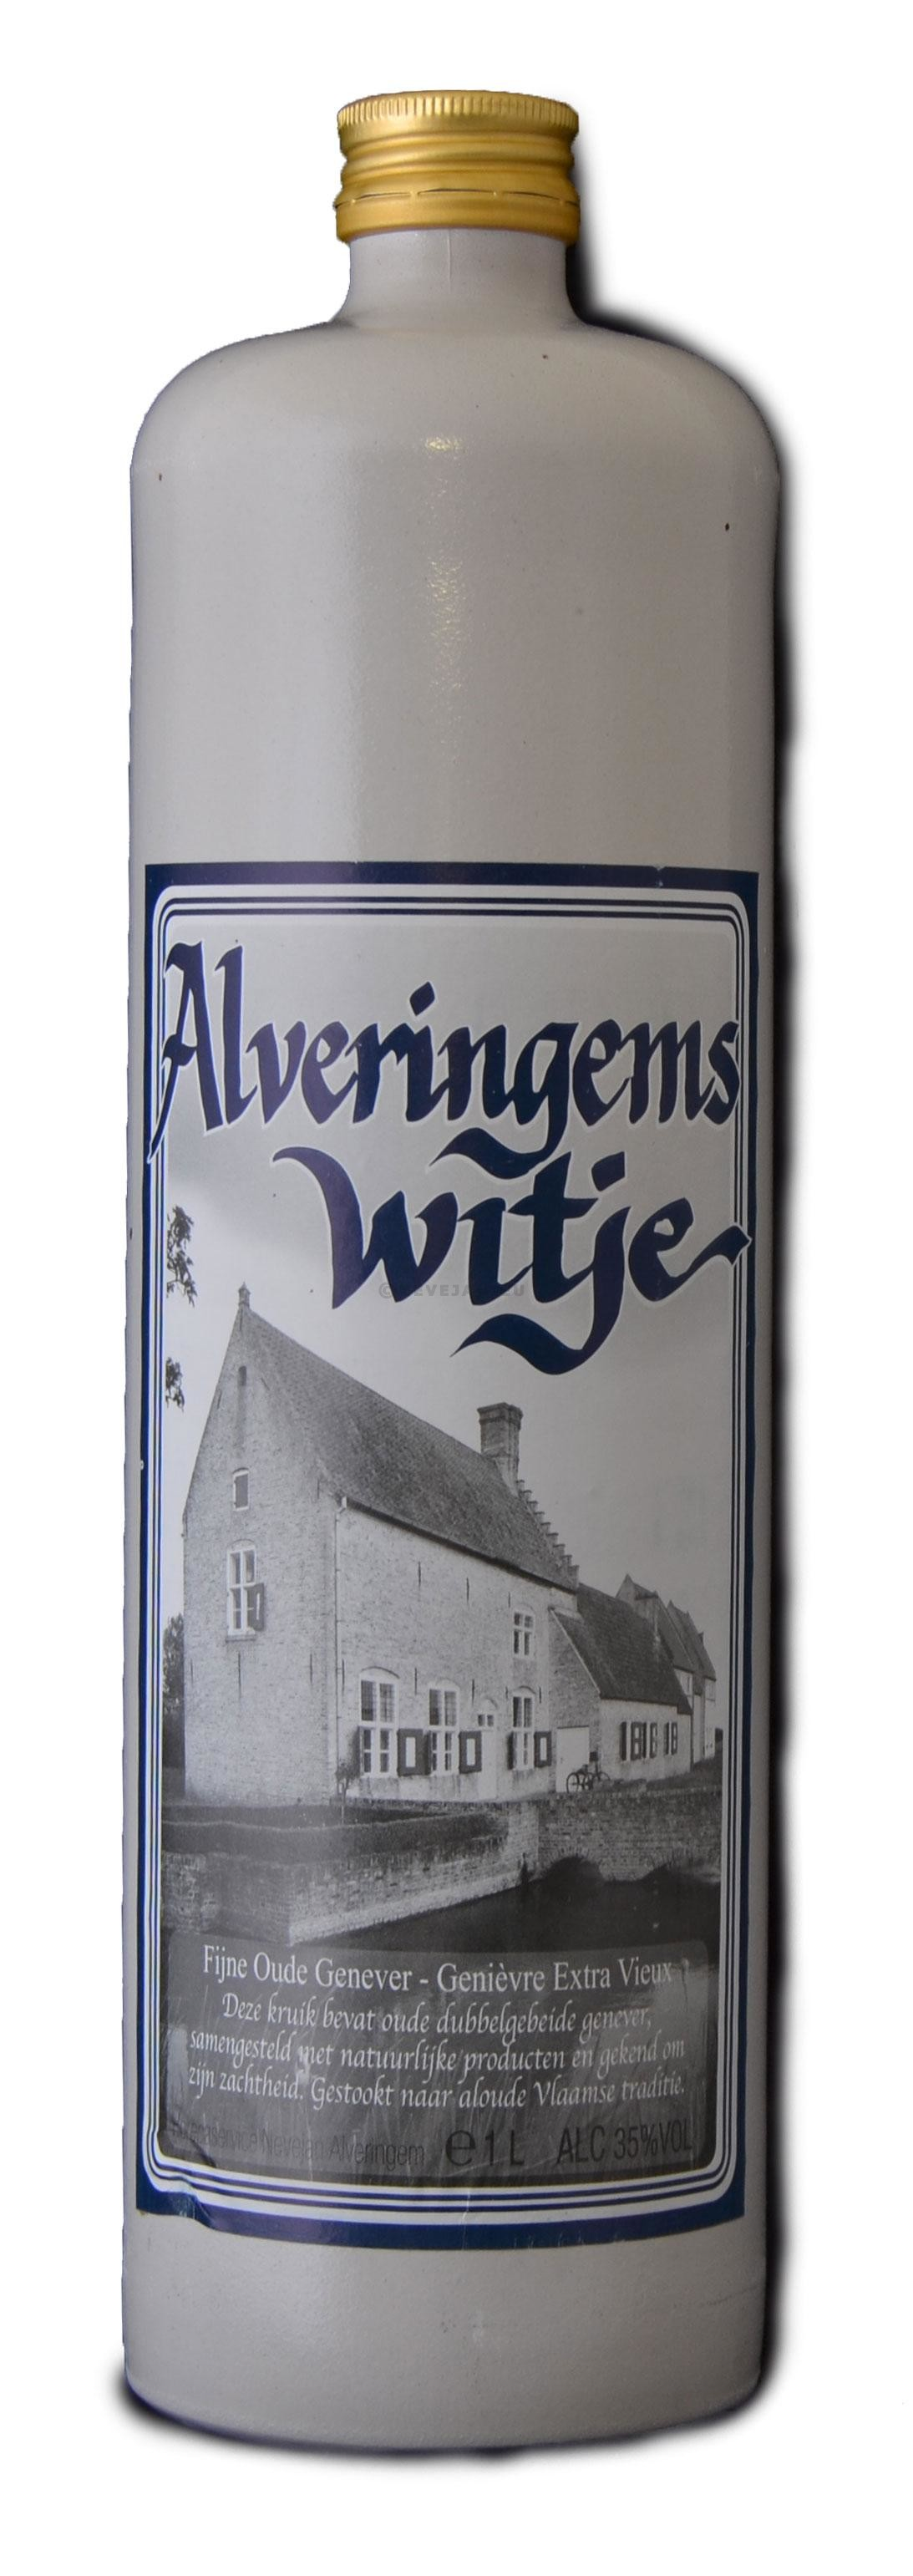 Genièvre Alveringems Witje 1L 35% cruchon